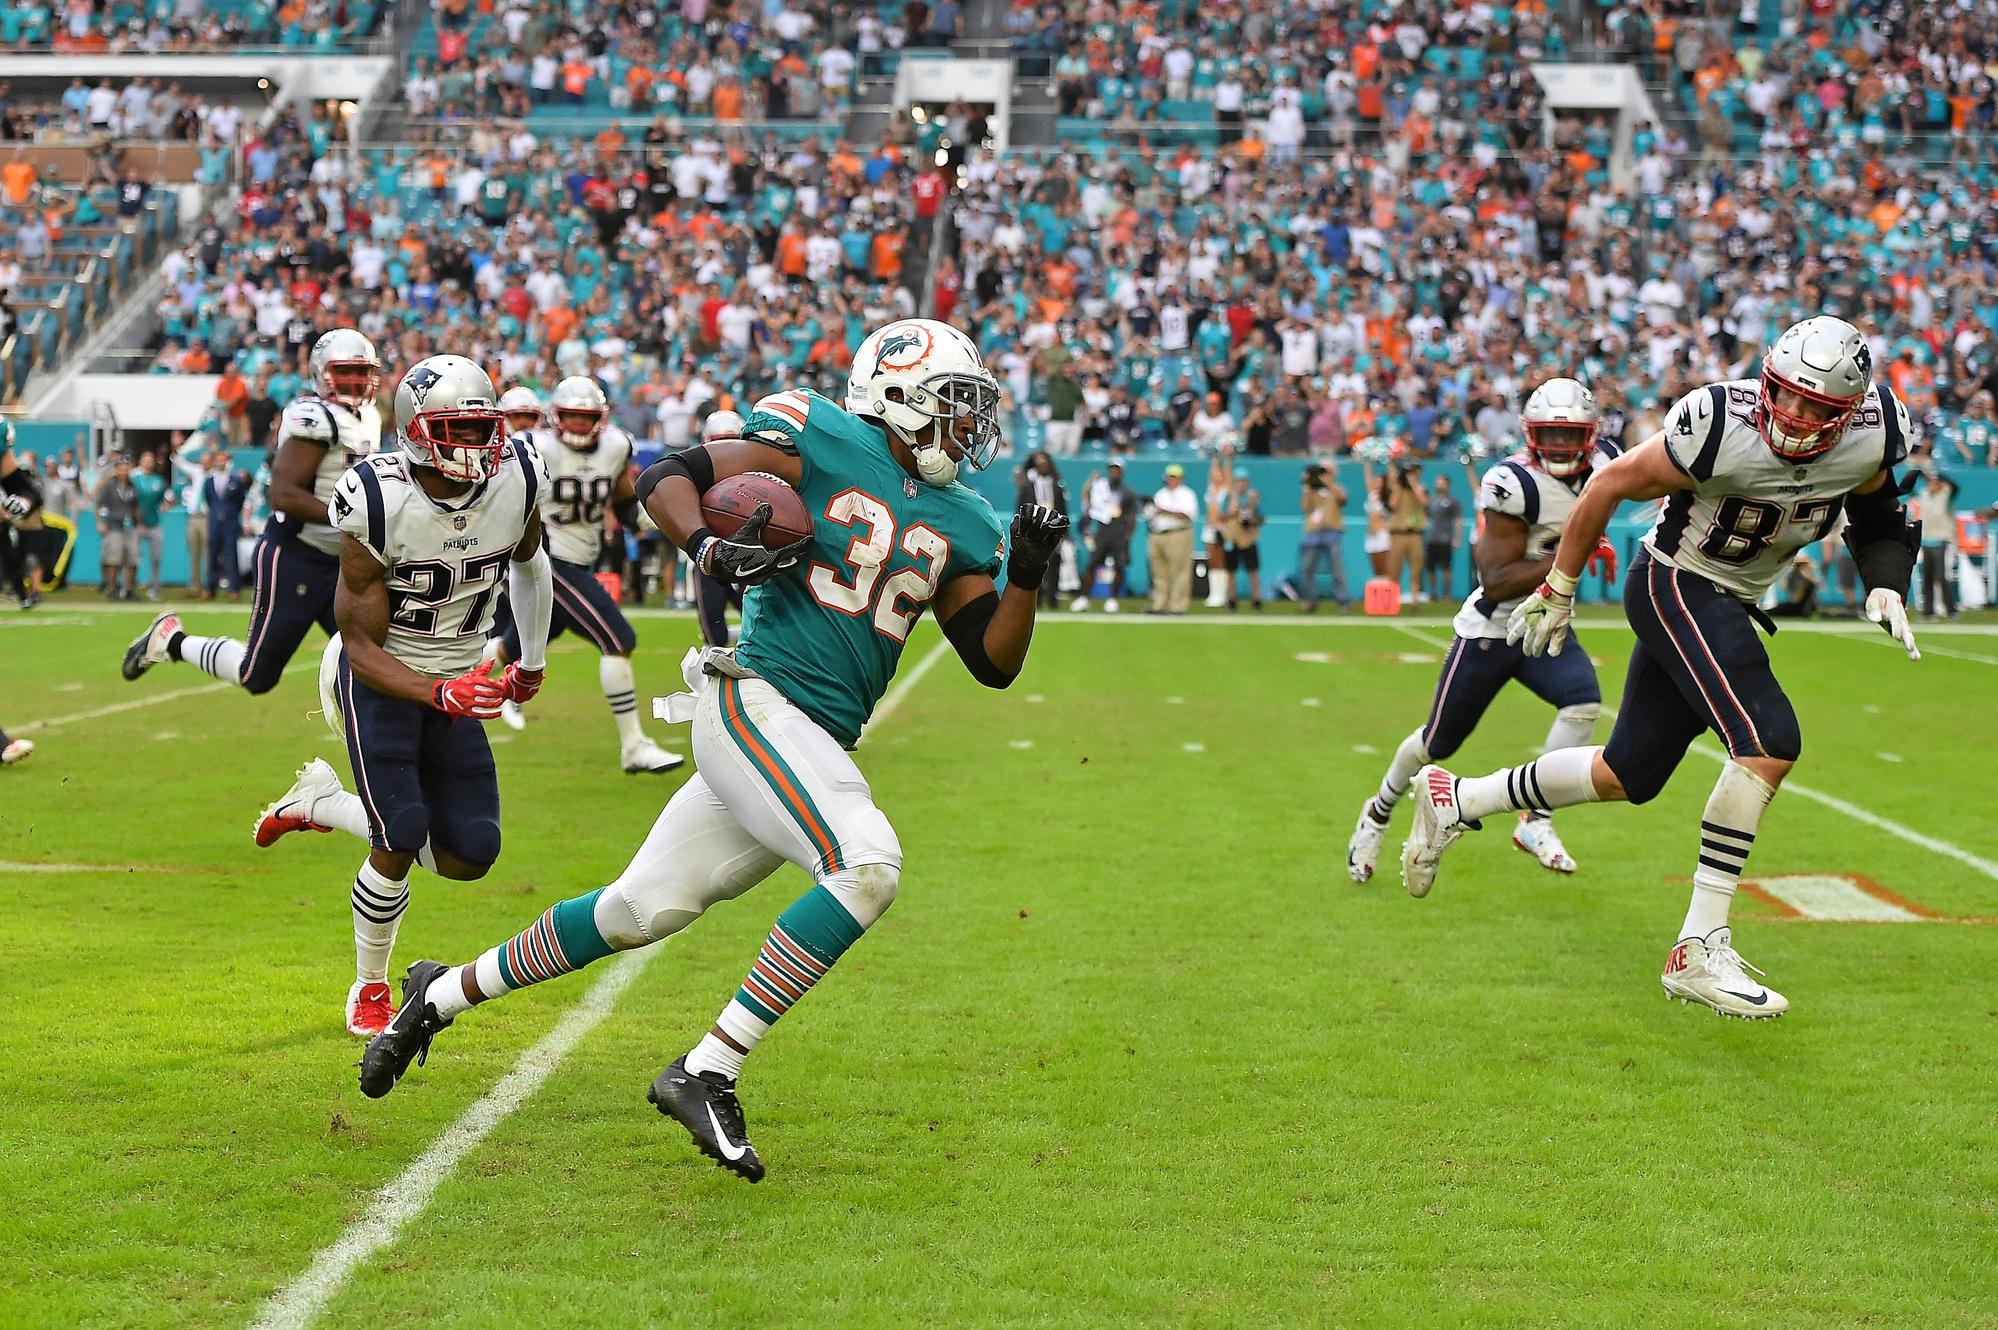 Refocused Nfl Week 14 Miami Dolphins 34 New England Patriots 33